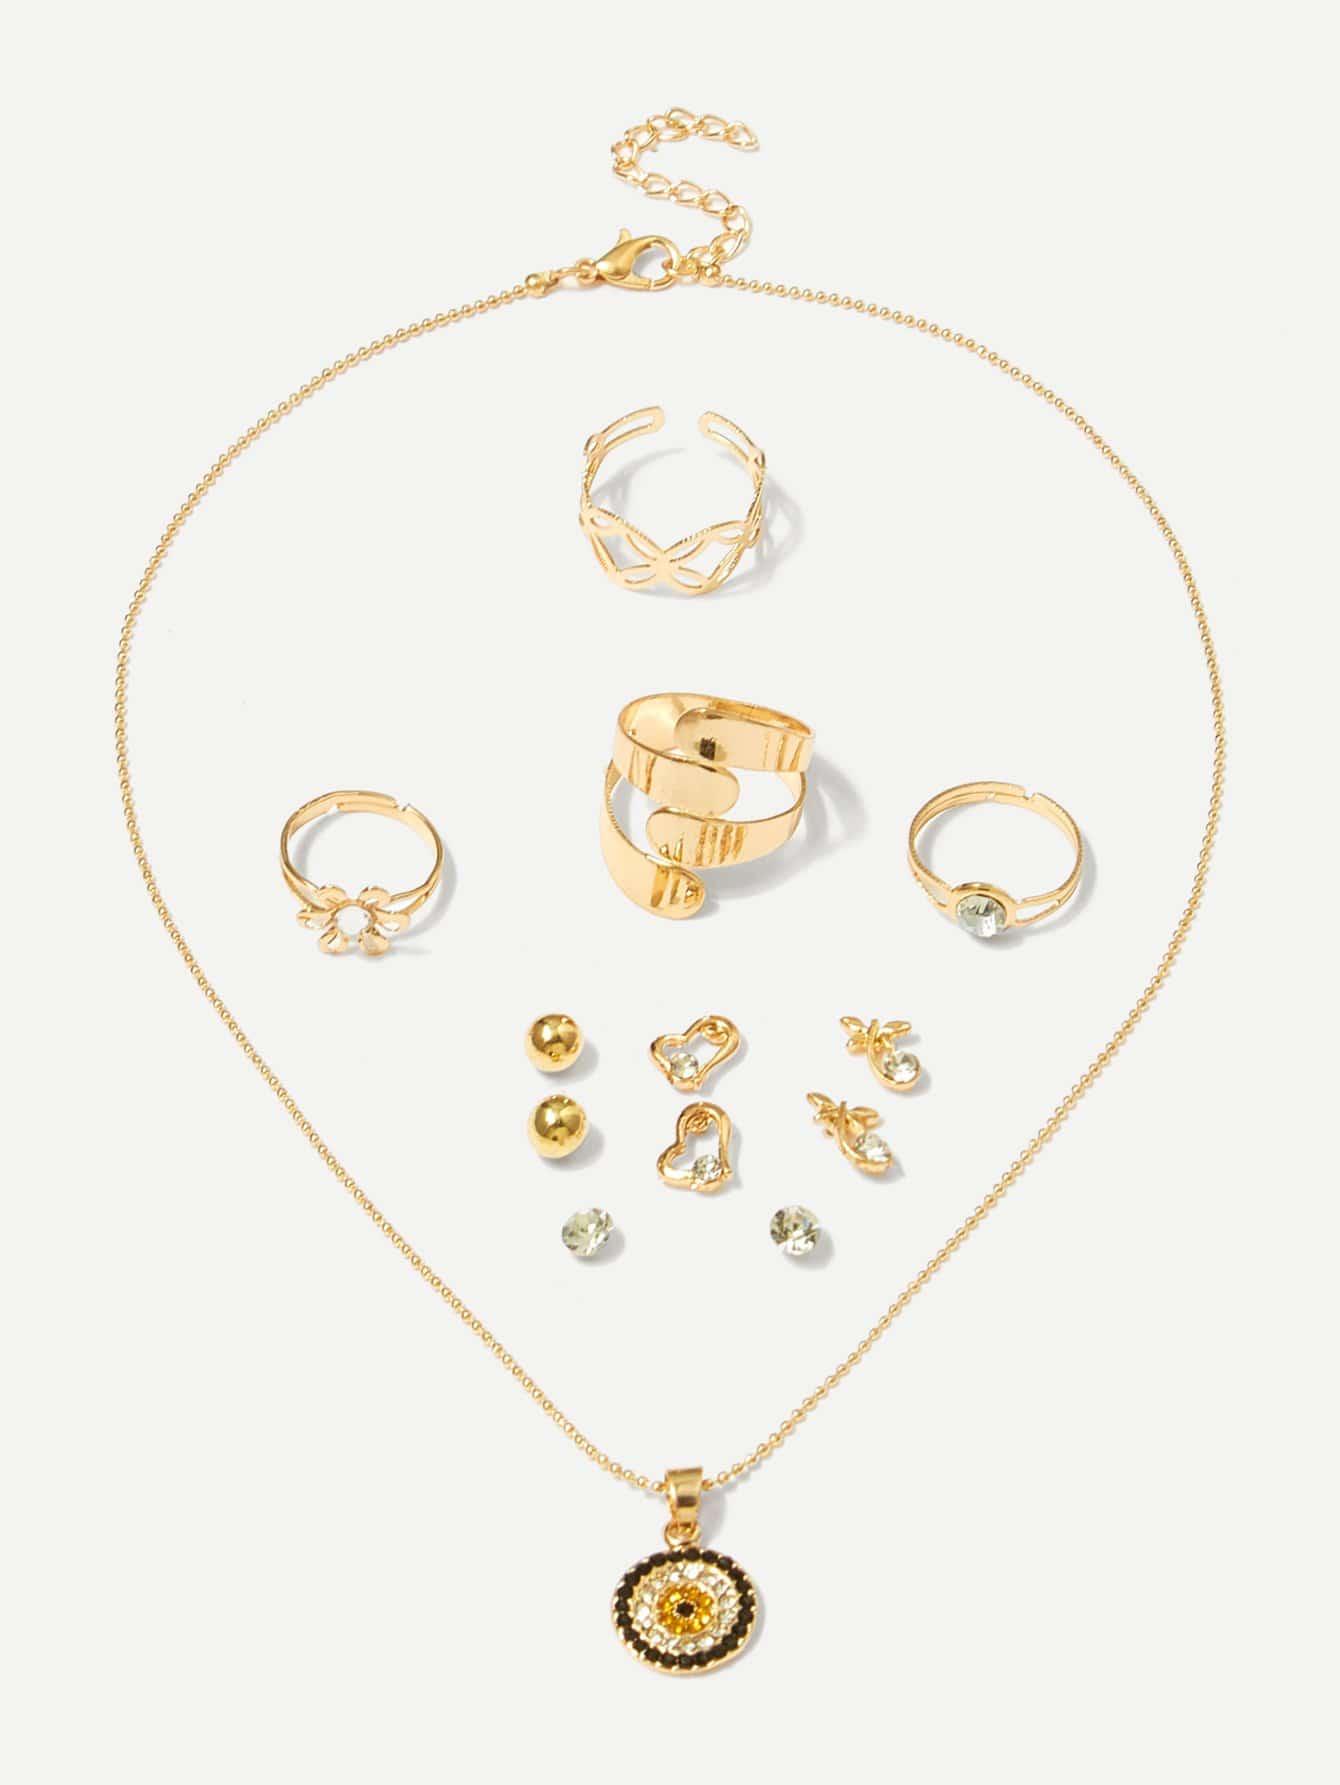 Anhänger Halskette 1pc & Ring 4pcs & Ohrringe 4pairs